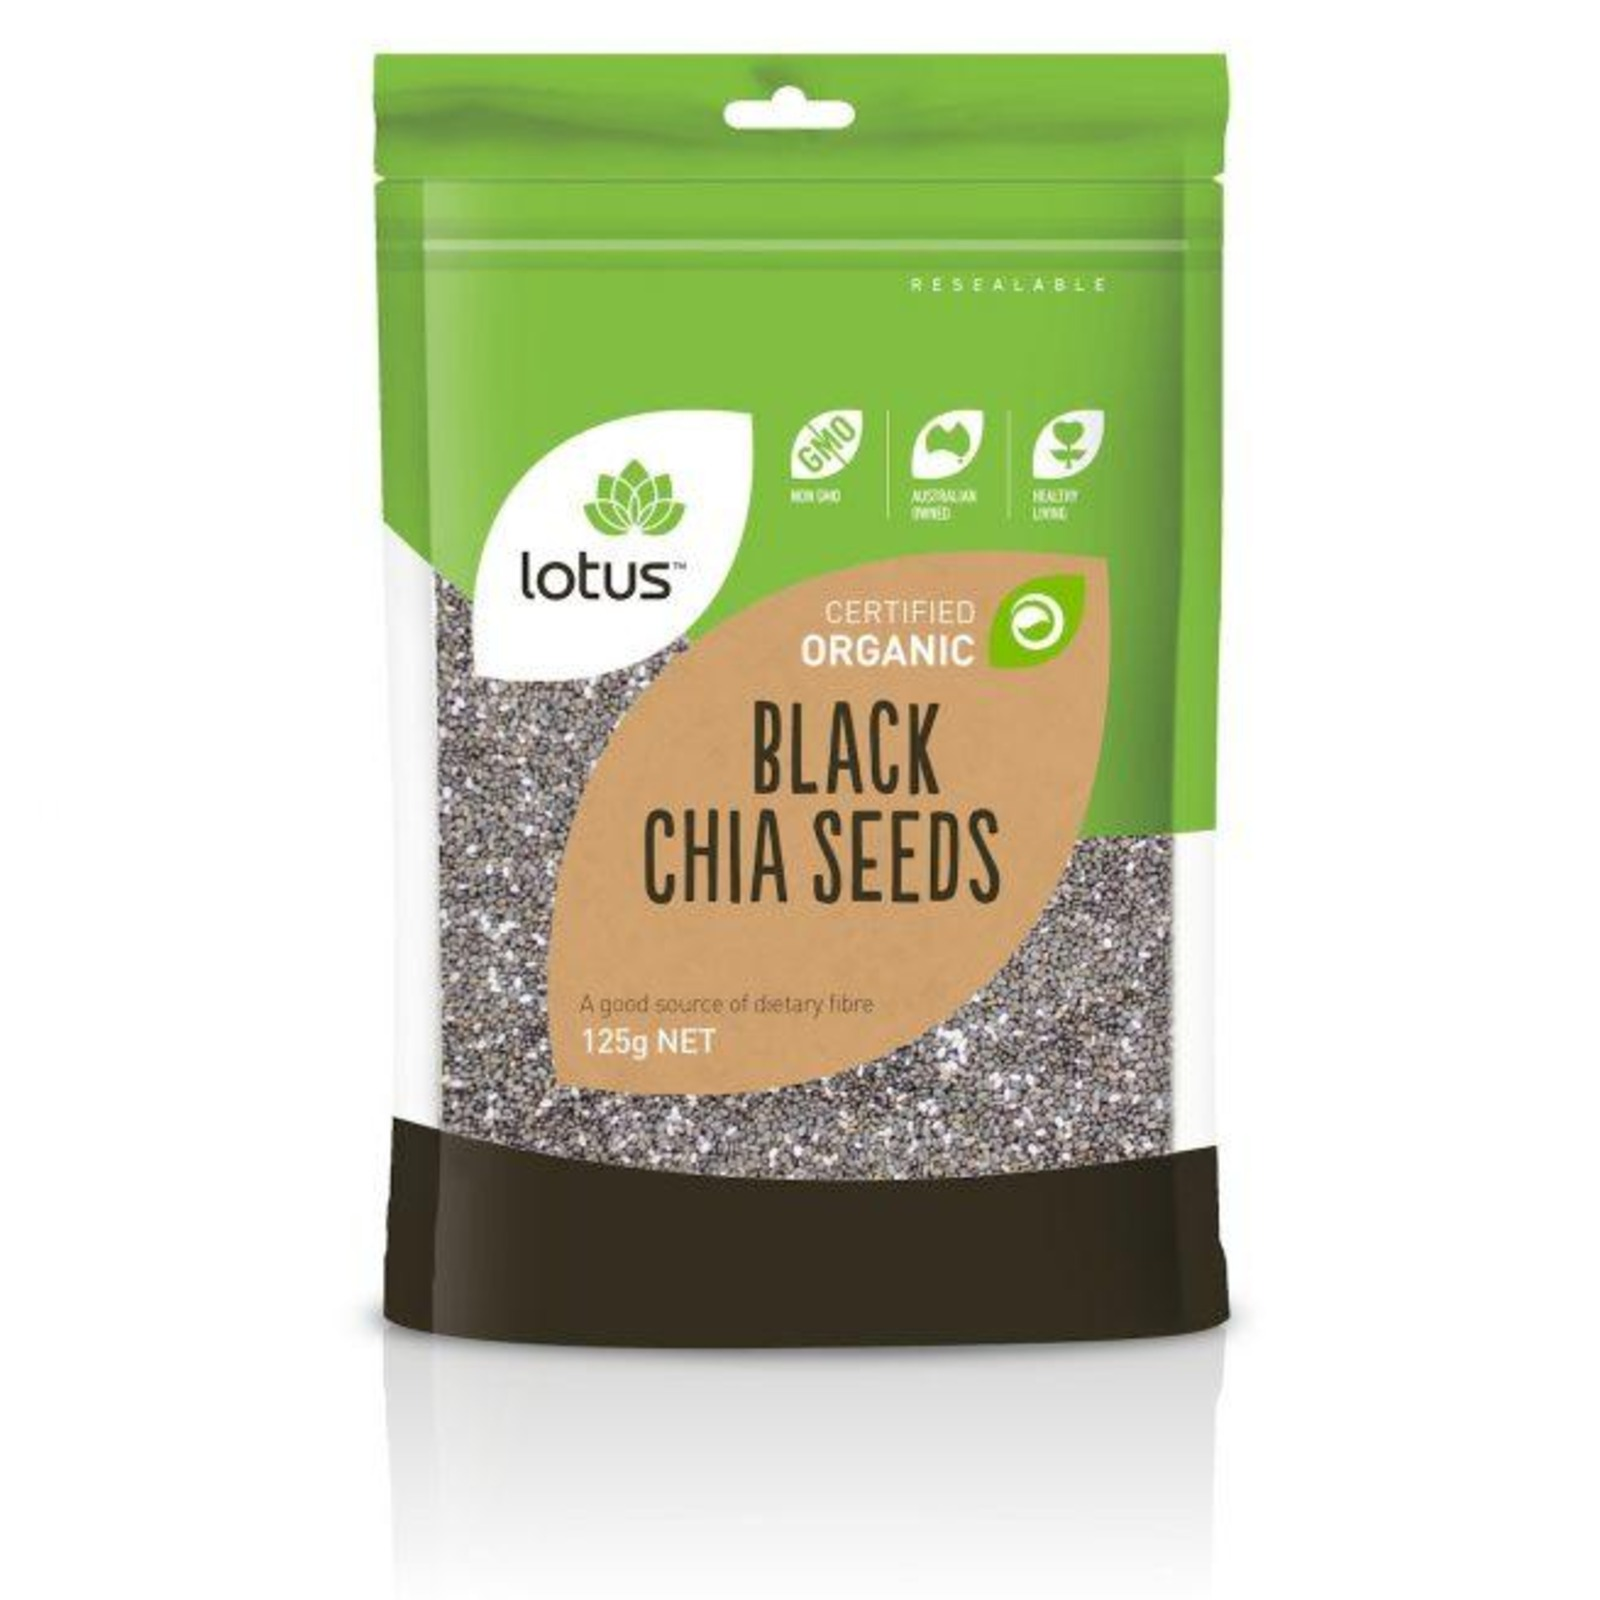 Lotus Organic Black Chia Seeds